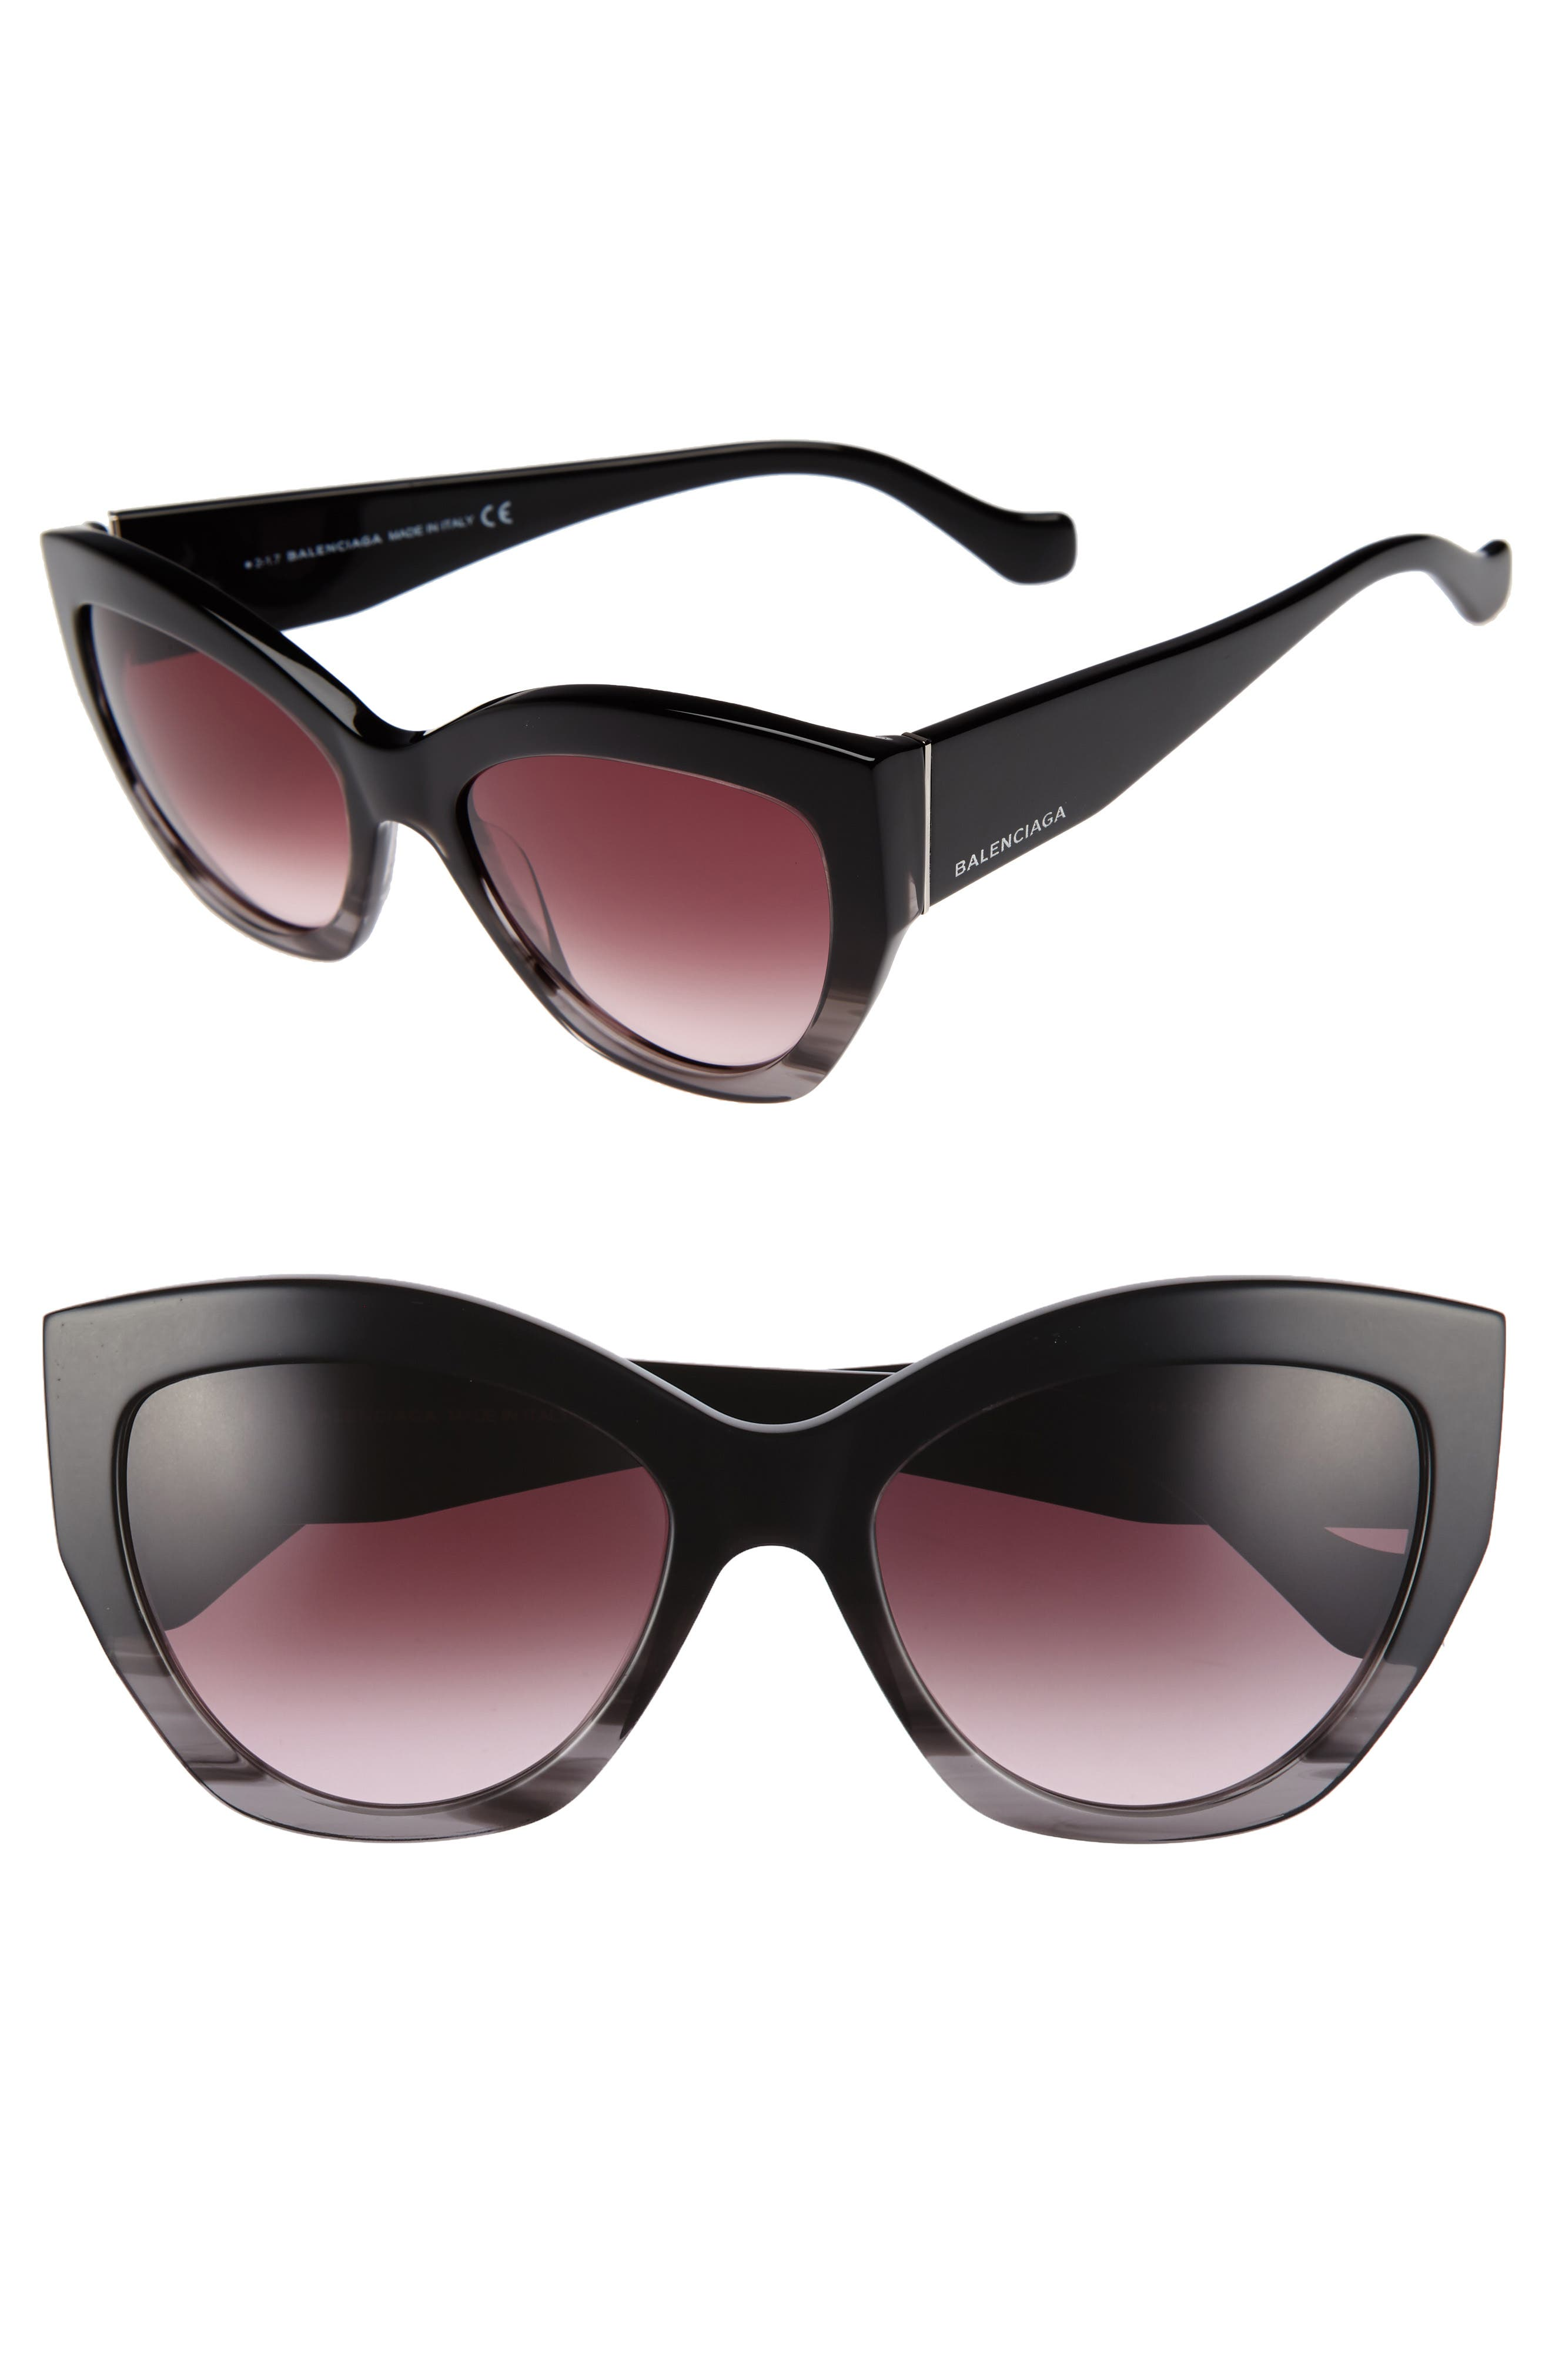 Balenciaga 56mm Cat Eye Sunglasses